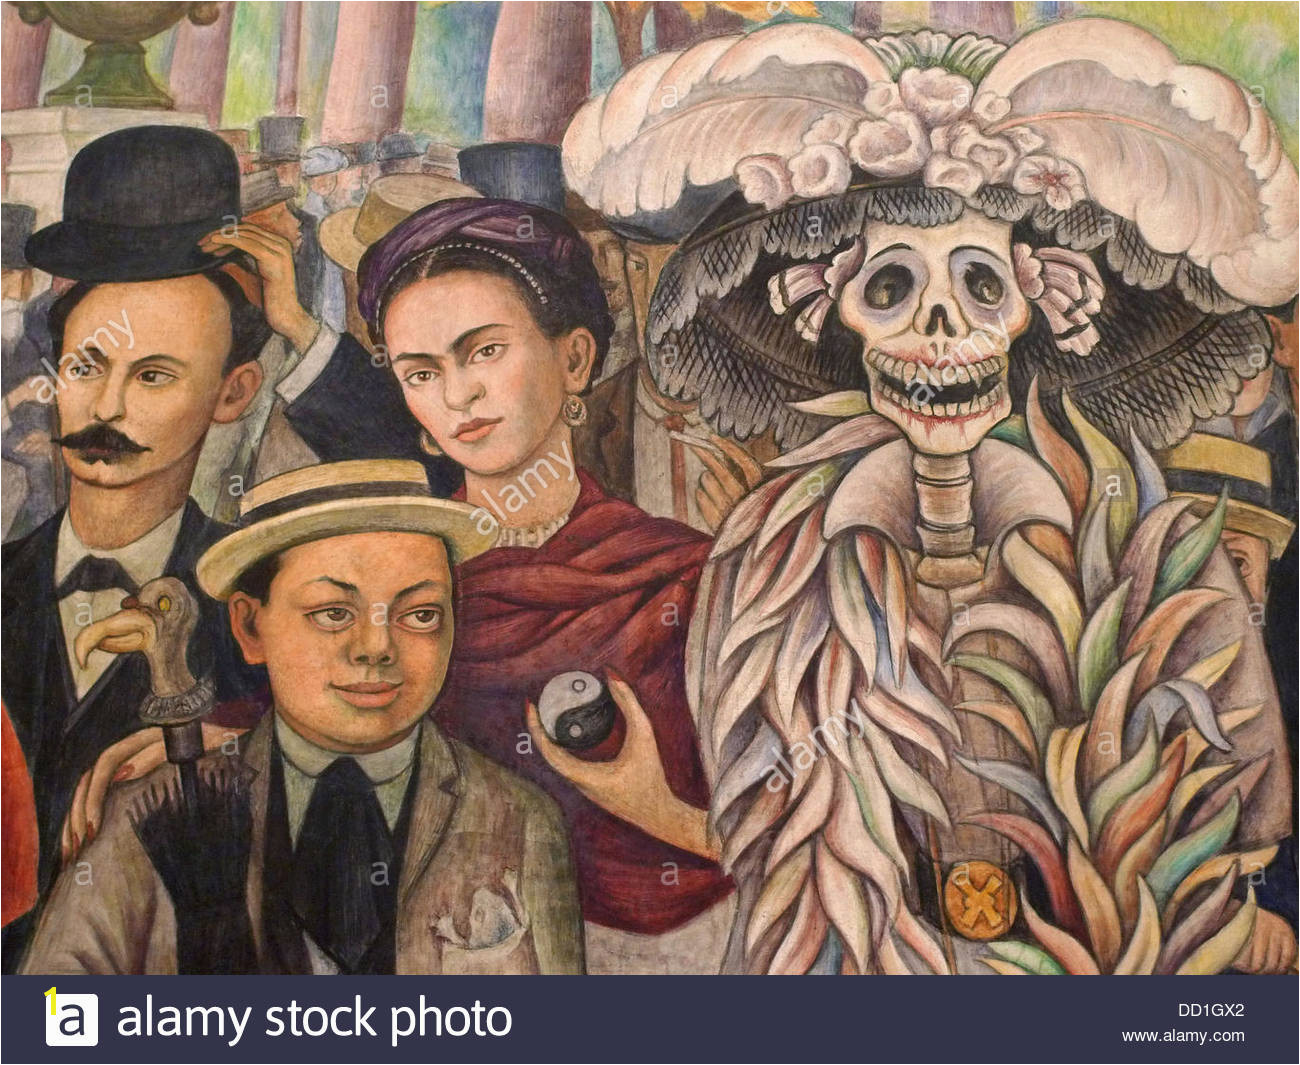 Museo mural Diego Rivera Ciudad de México Stockbild